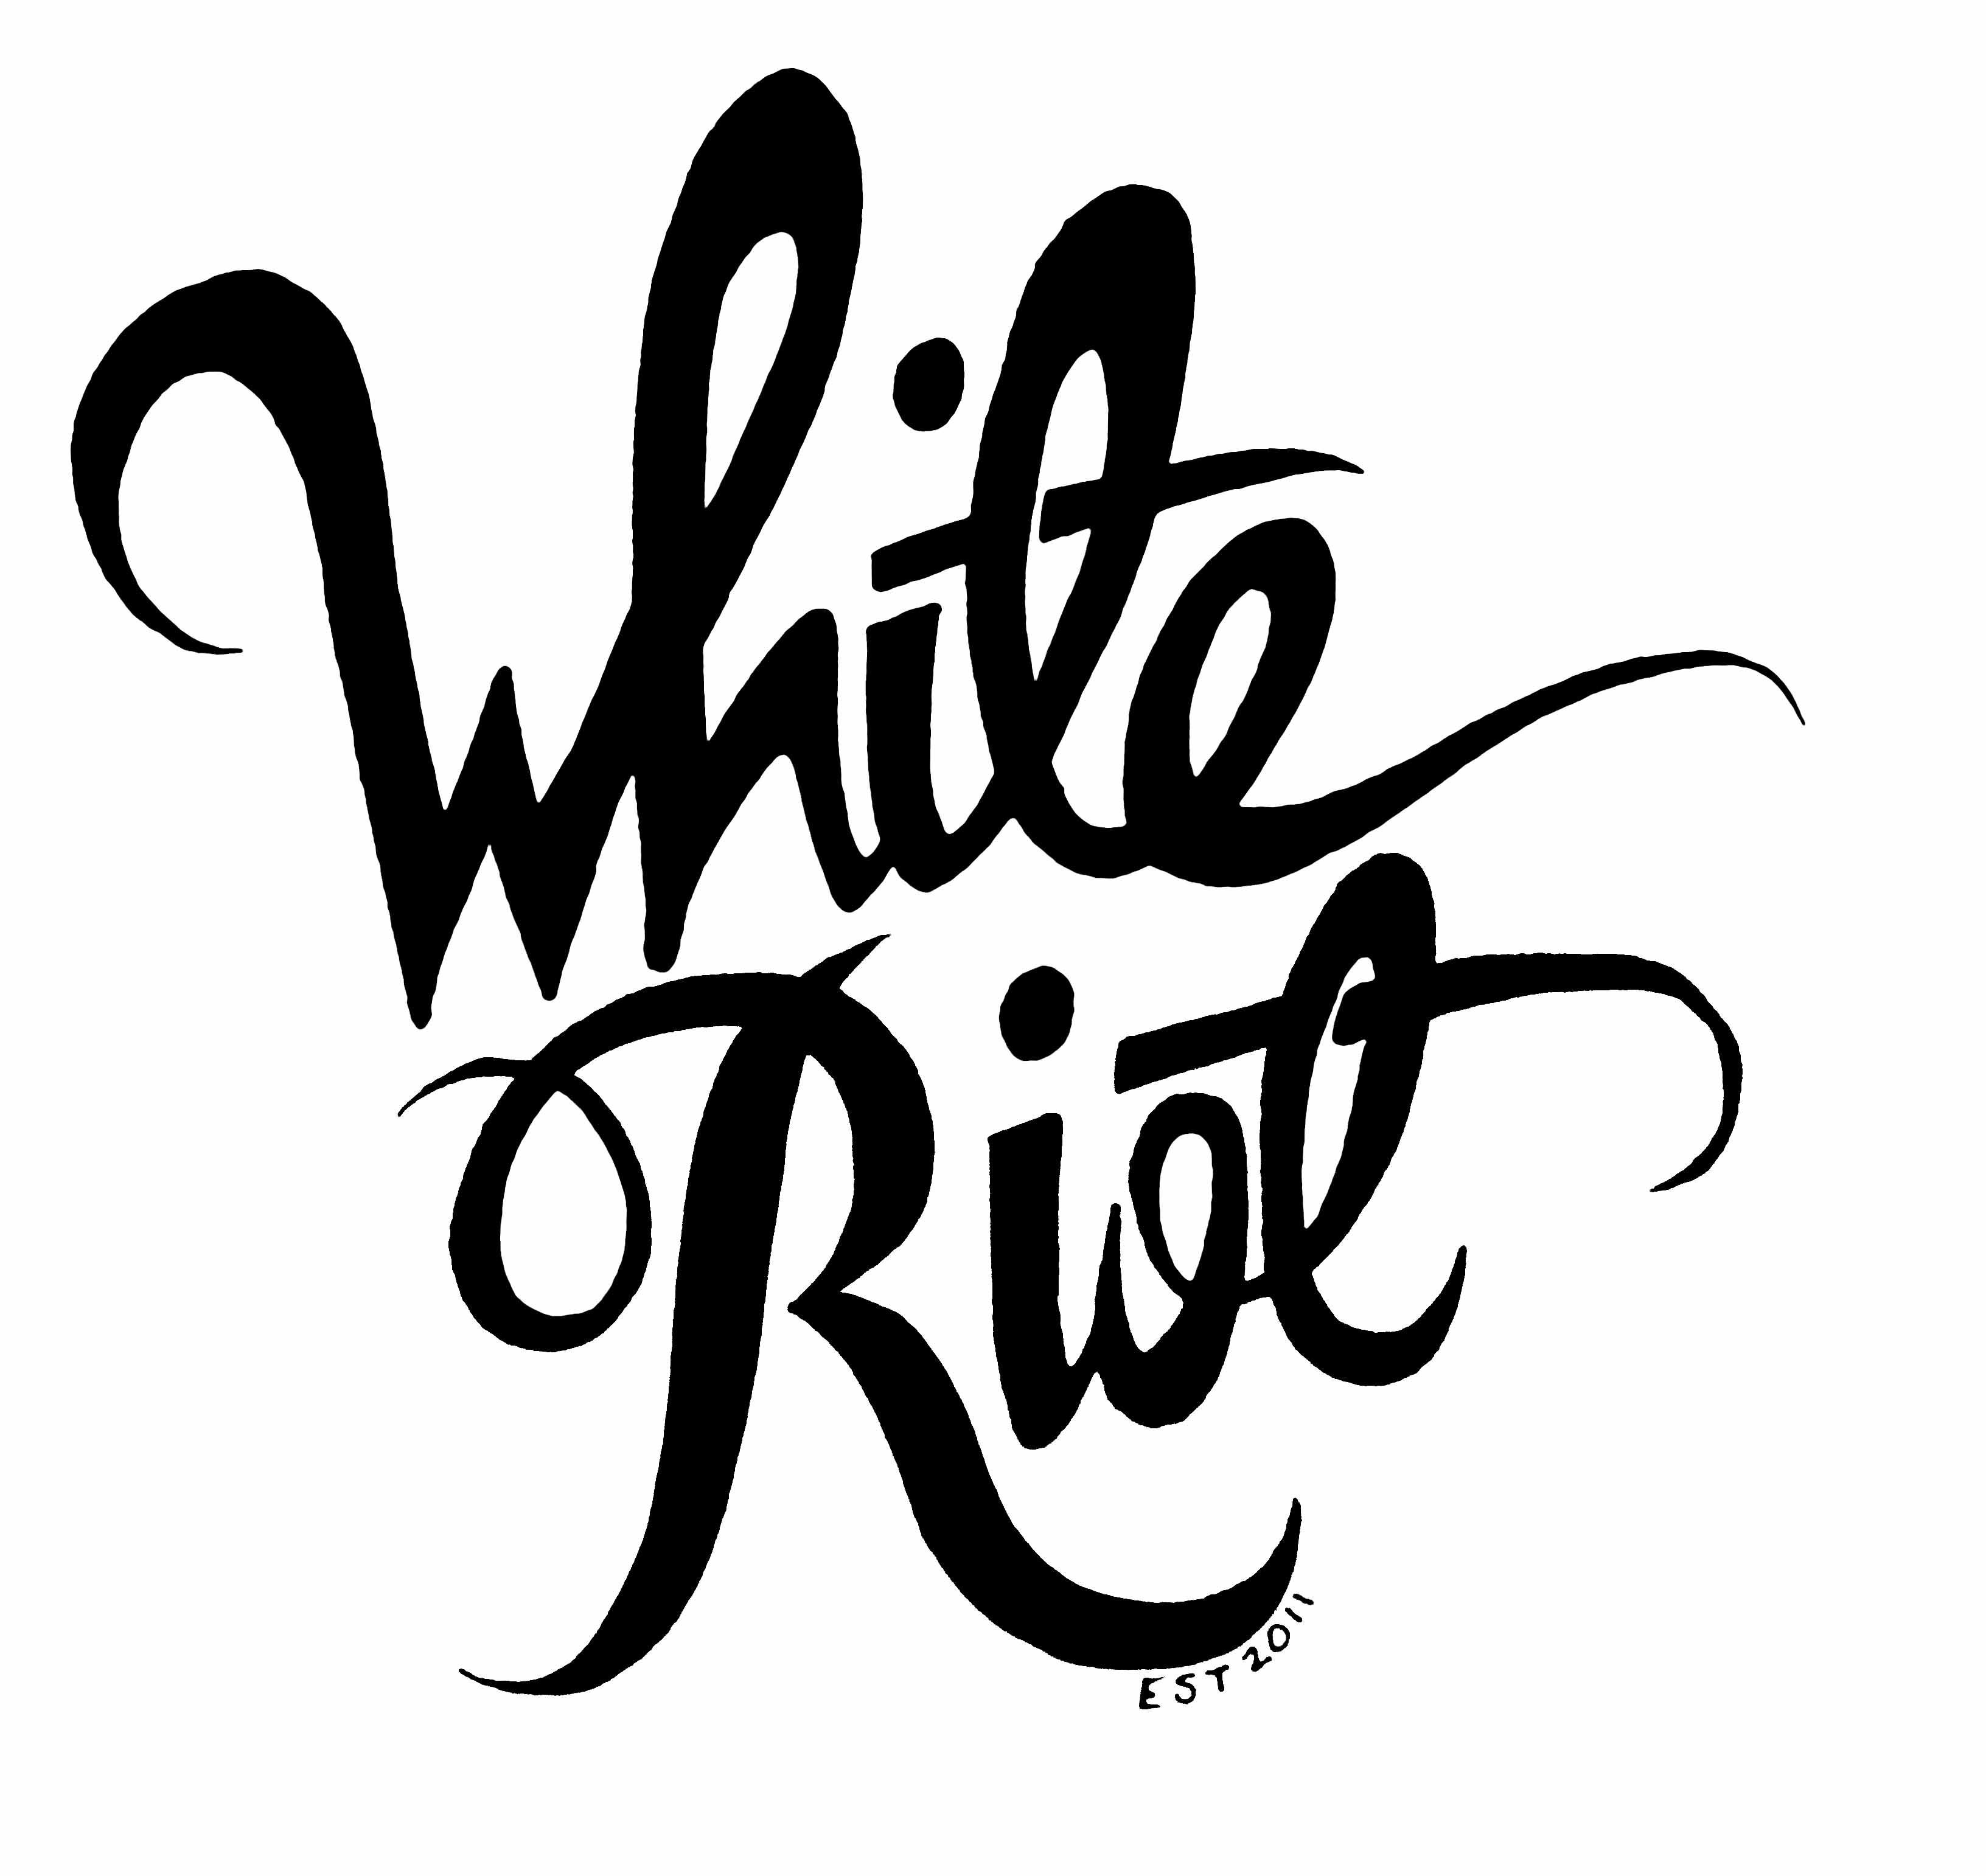 http://static.tumblr.com/d490296a99e5aef8f64874e5c9731c22/a4kapwi/Lgfn34rj0/tumblr_static_white_riot_logo_lo.jpg